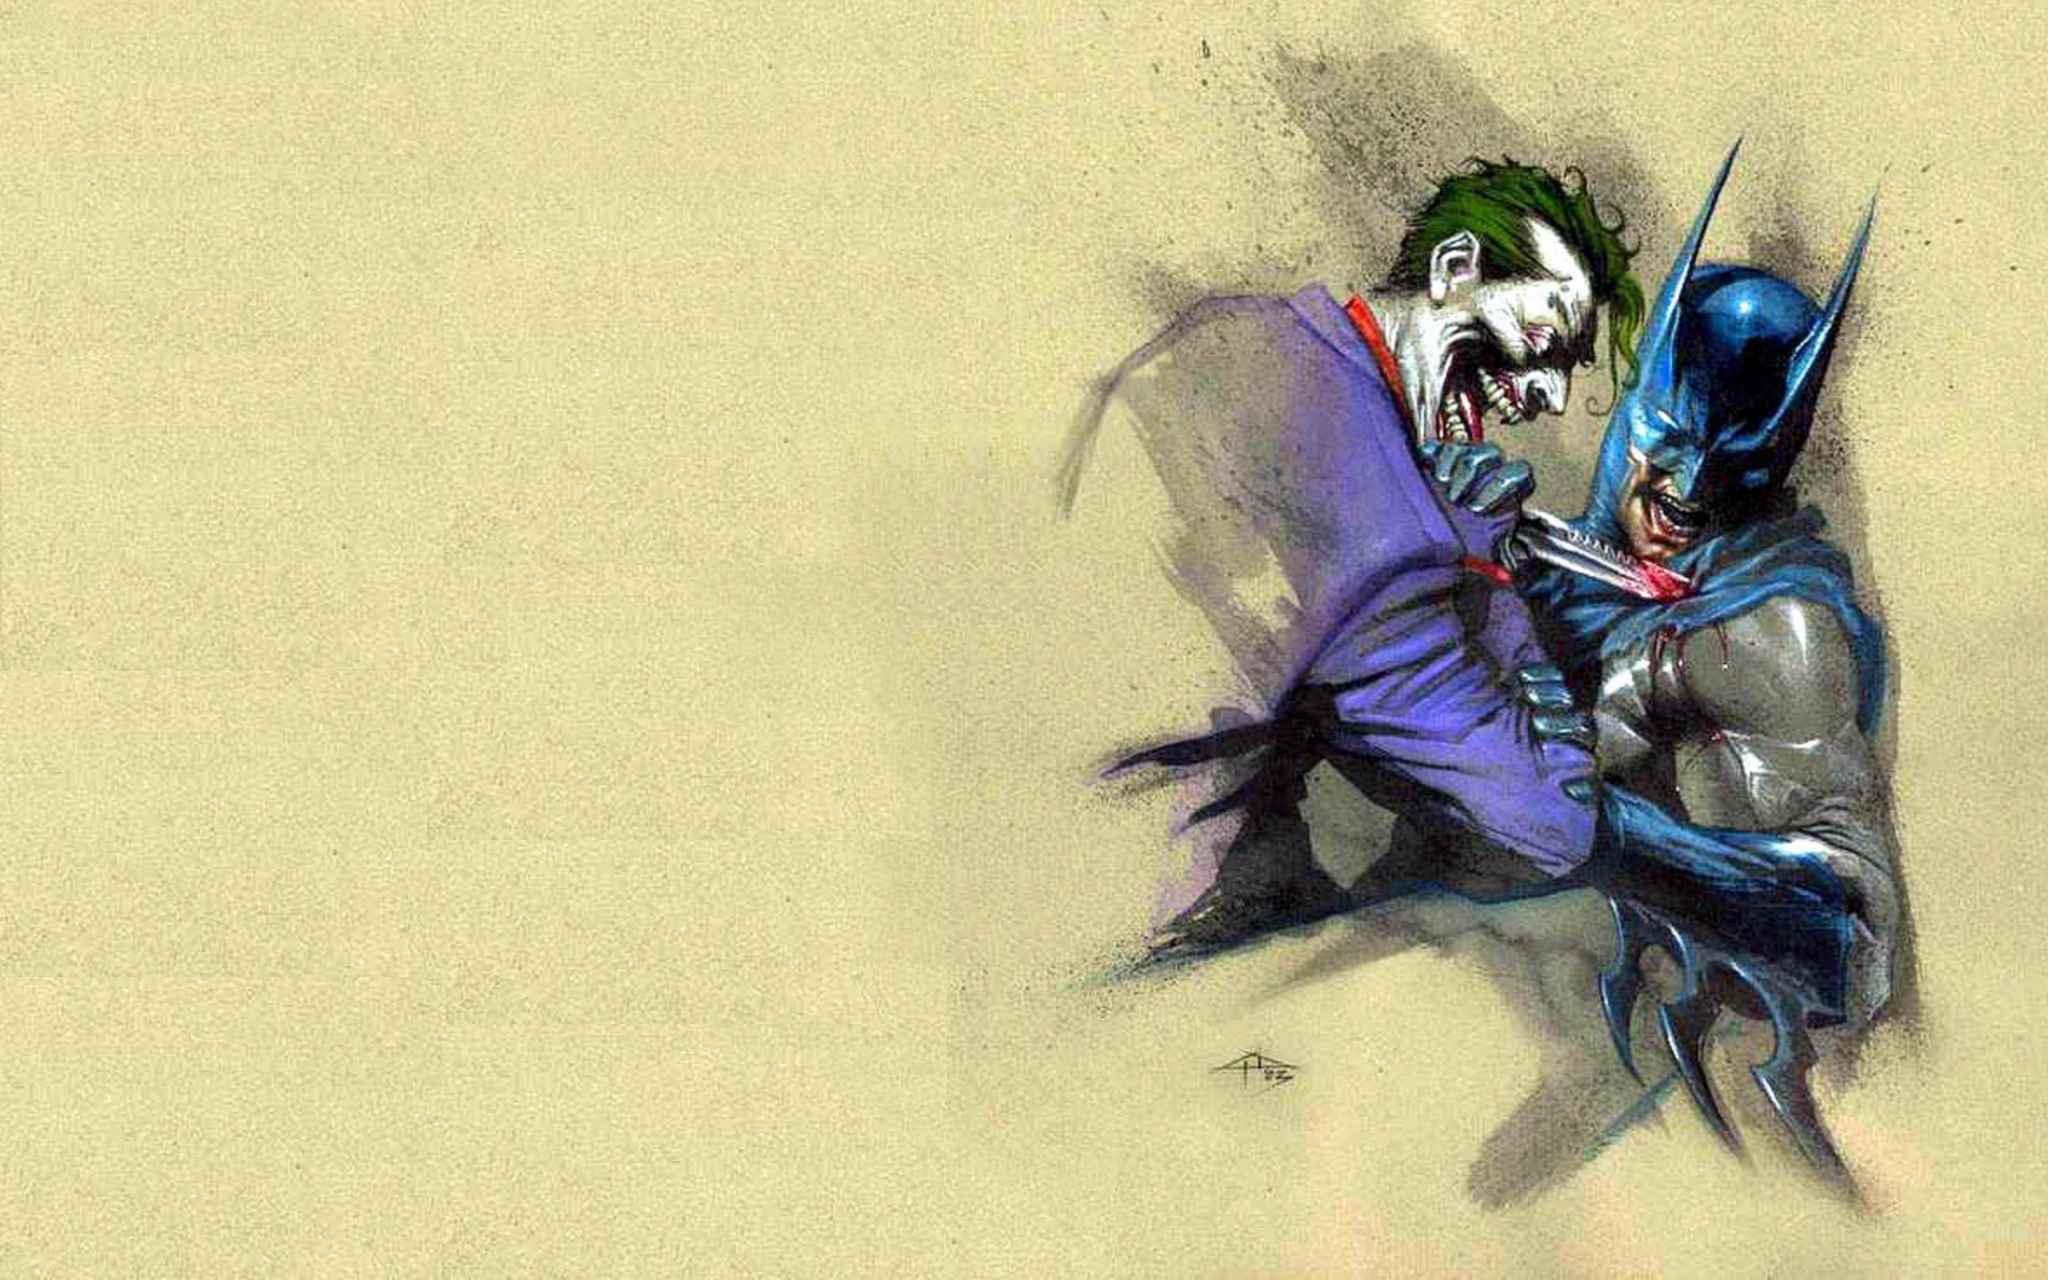 Бэтмен герои комиксов Джокер  № 3922444 бесплатно